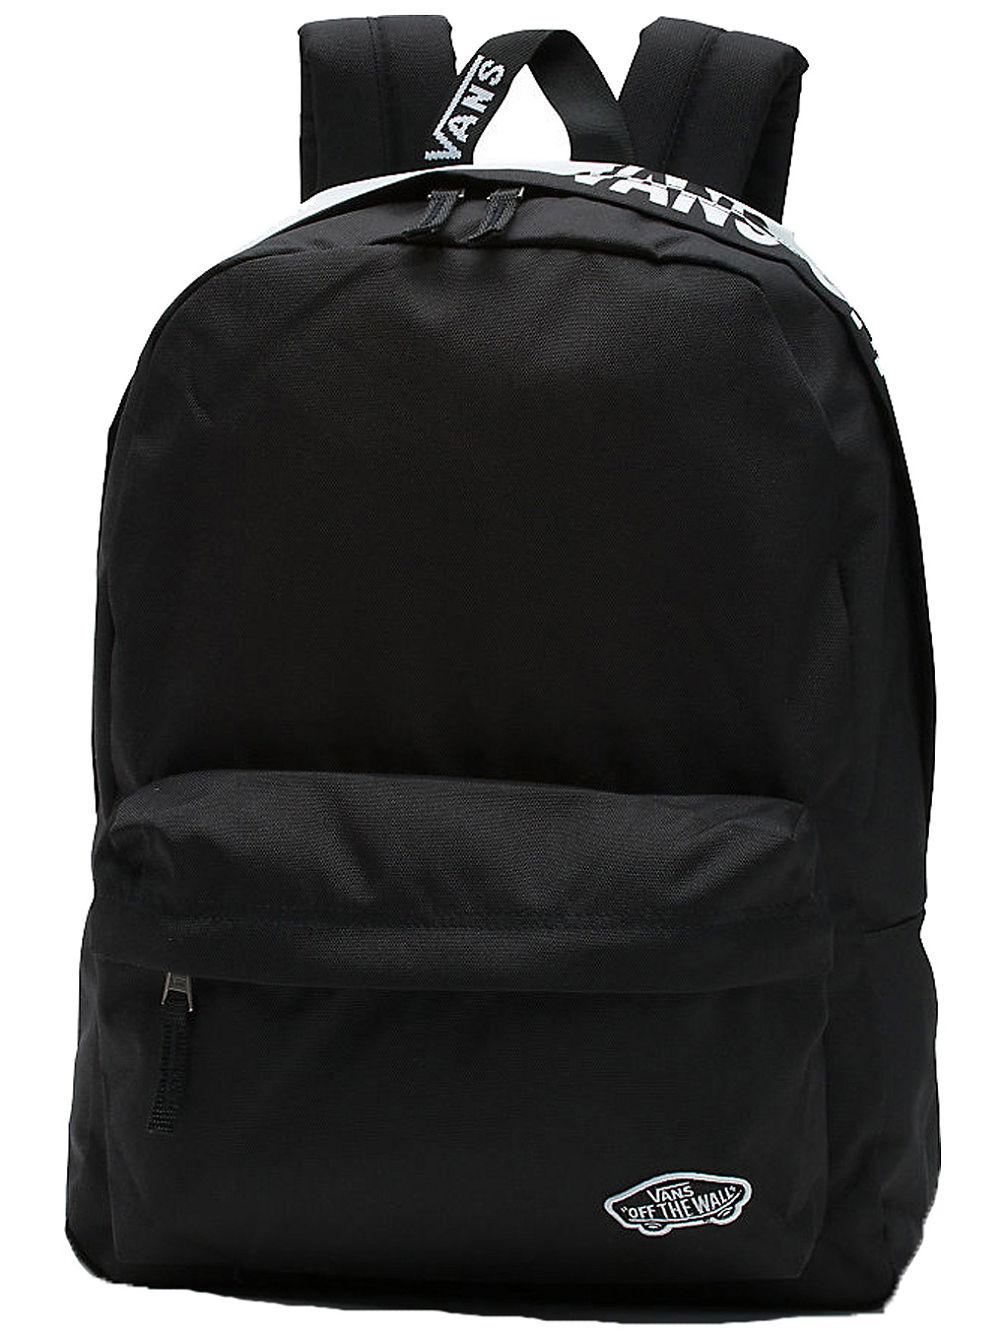 b87ba969d9 Buy Vans Sporty Realm Backpack online at Blue Tomato